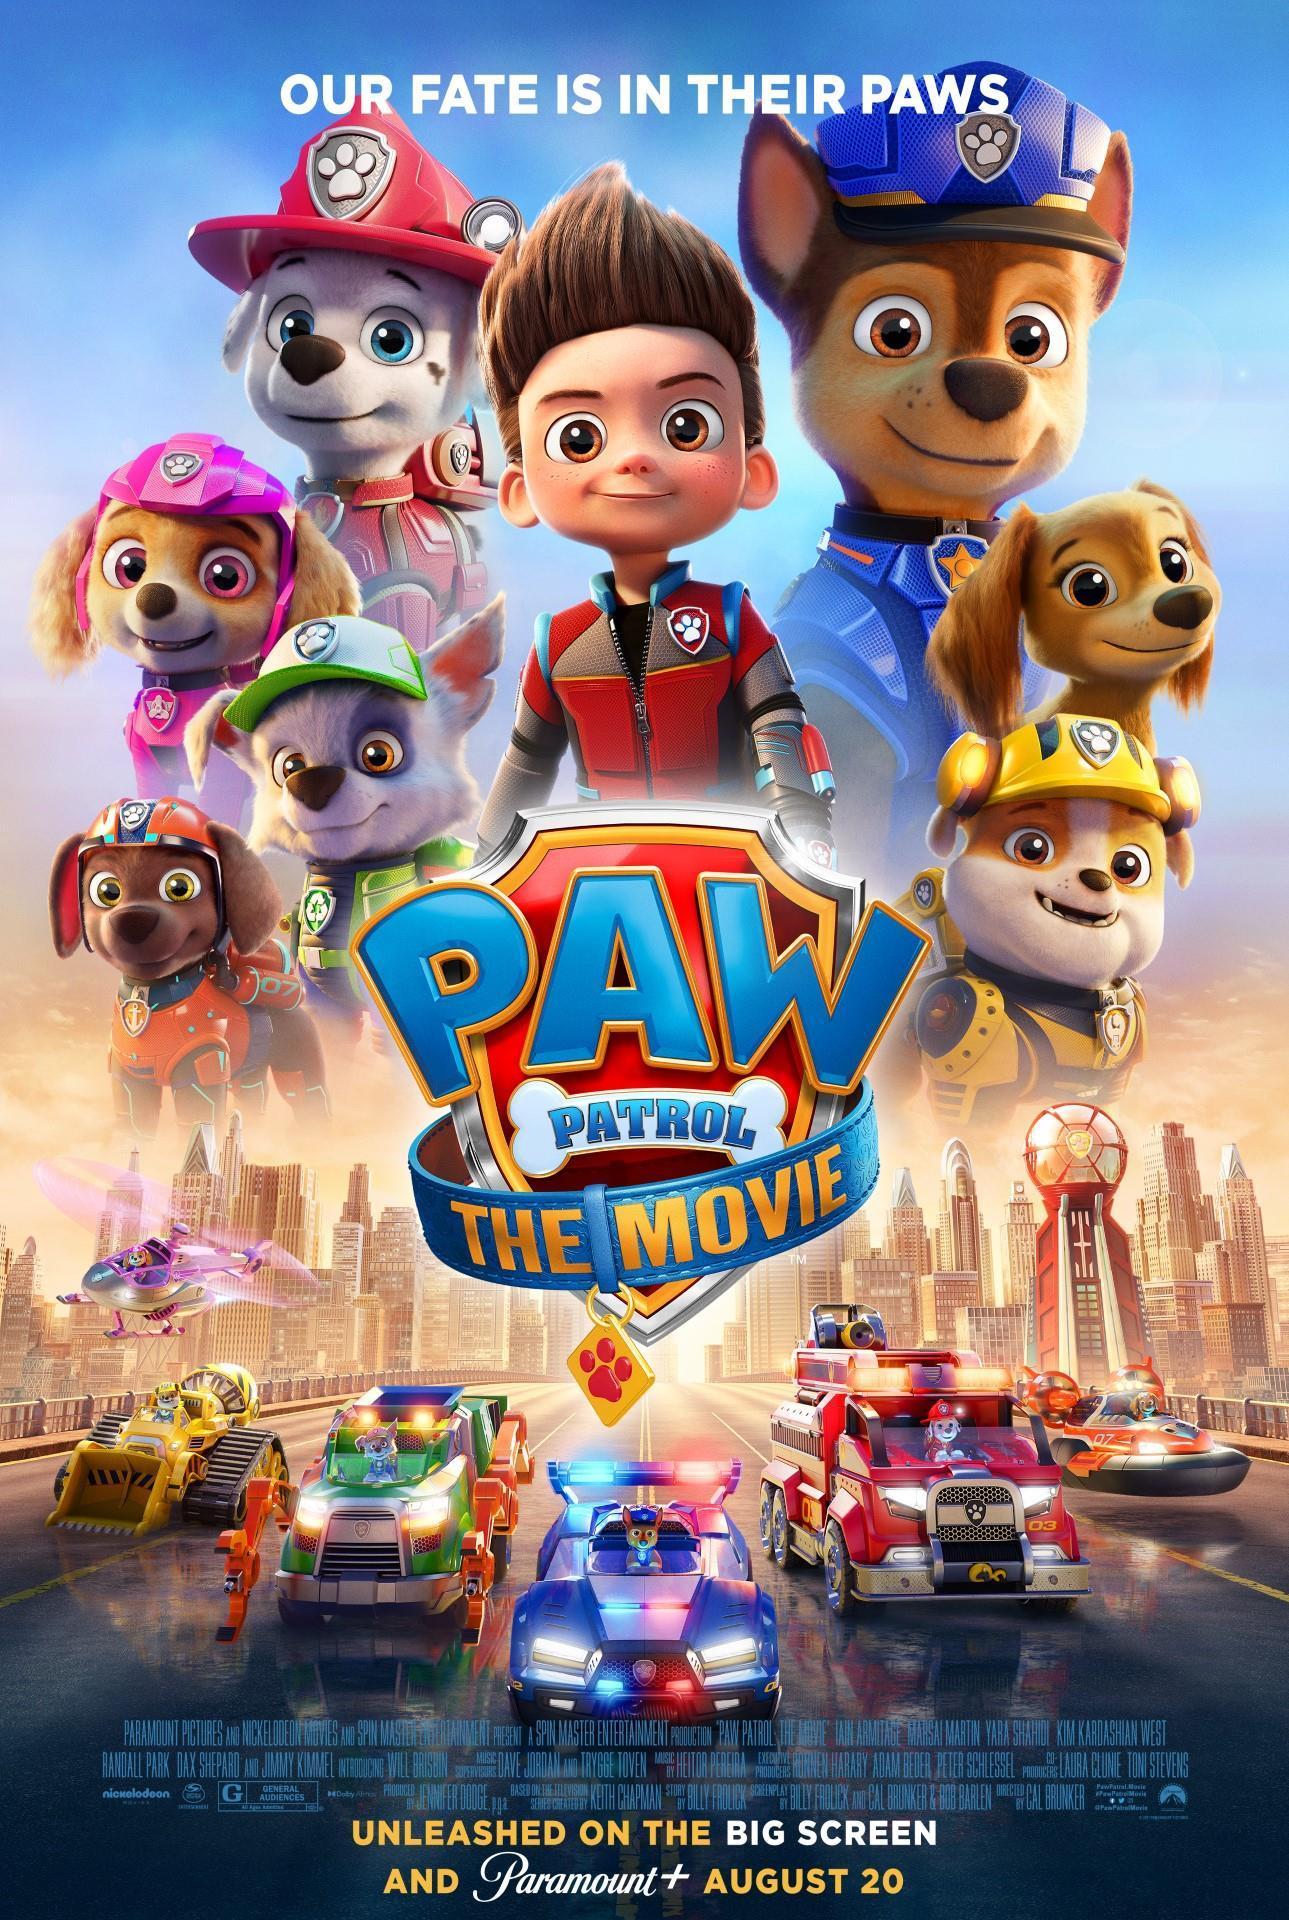 [Paw Patrol poster]